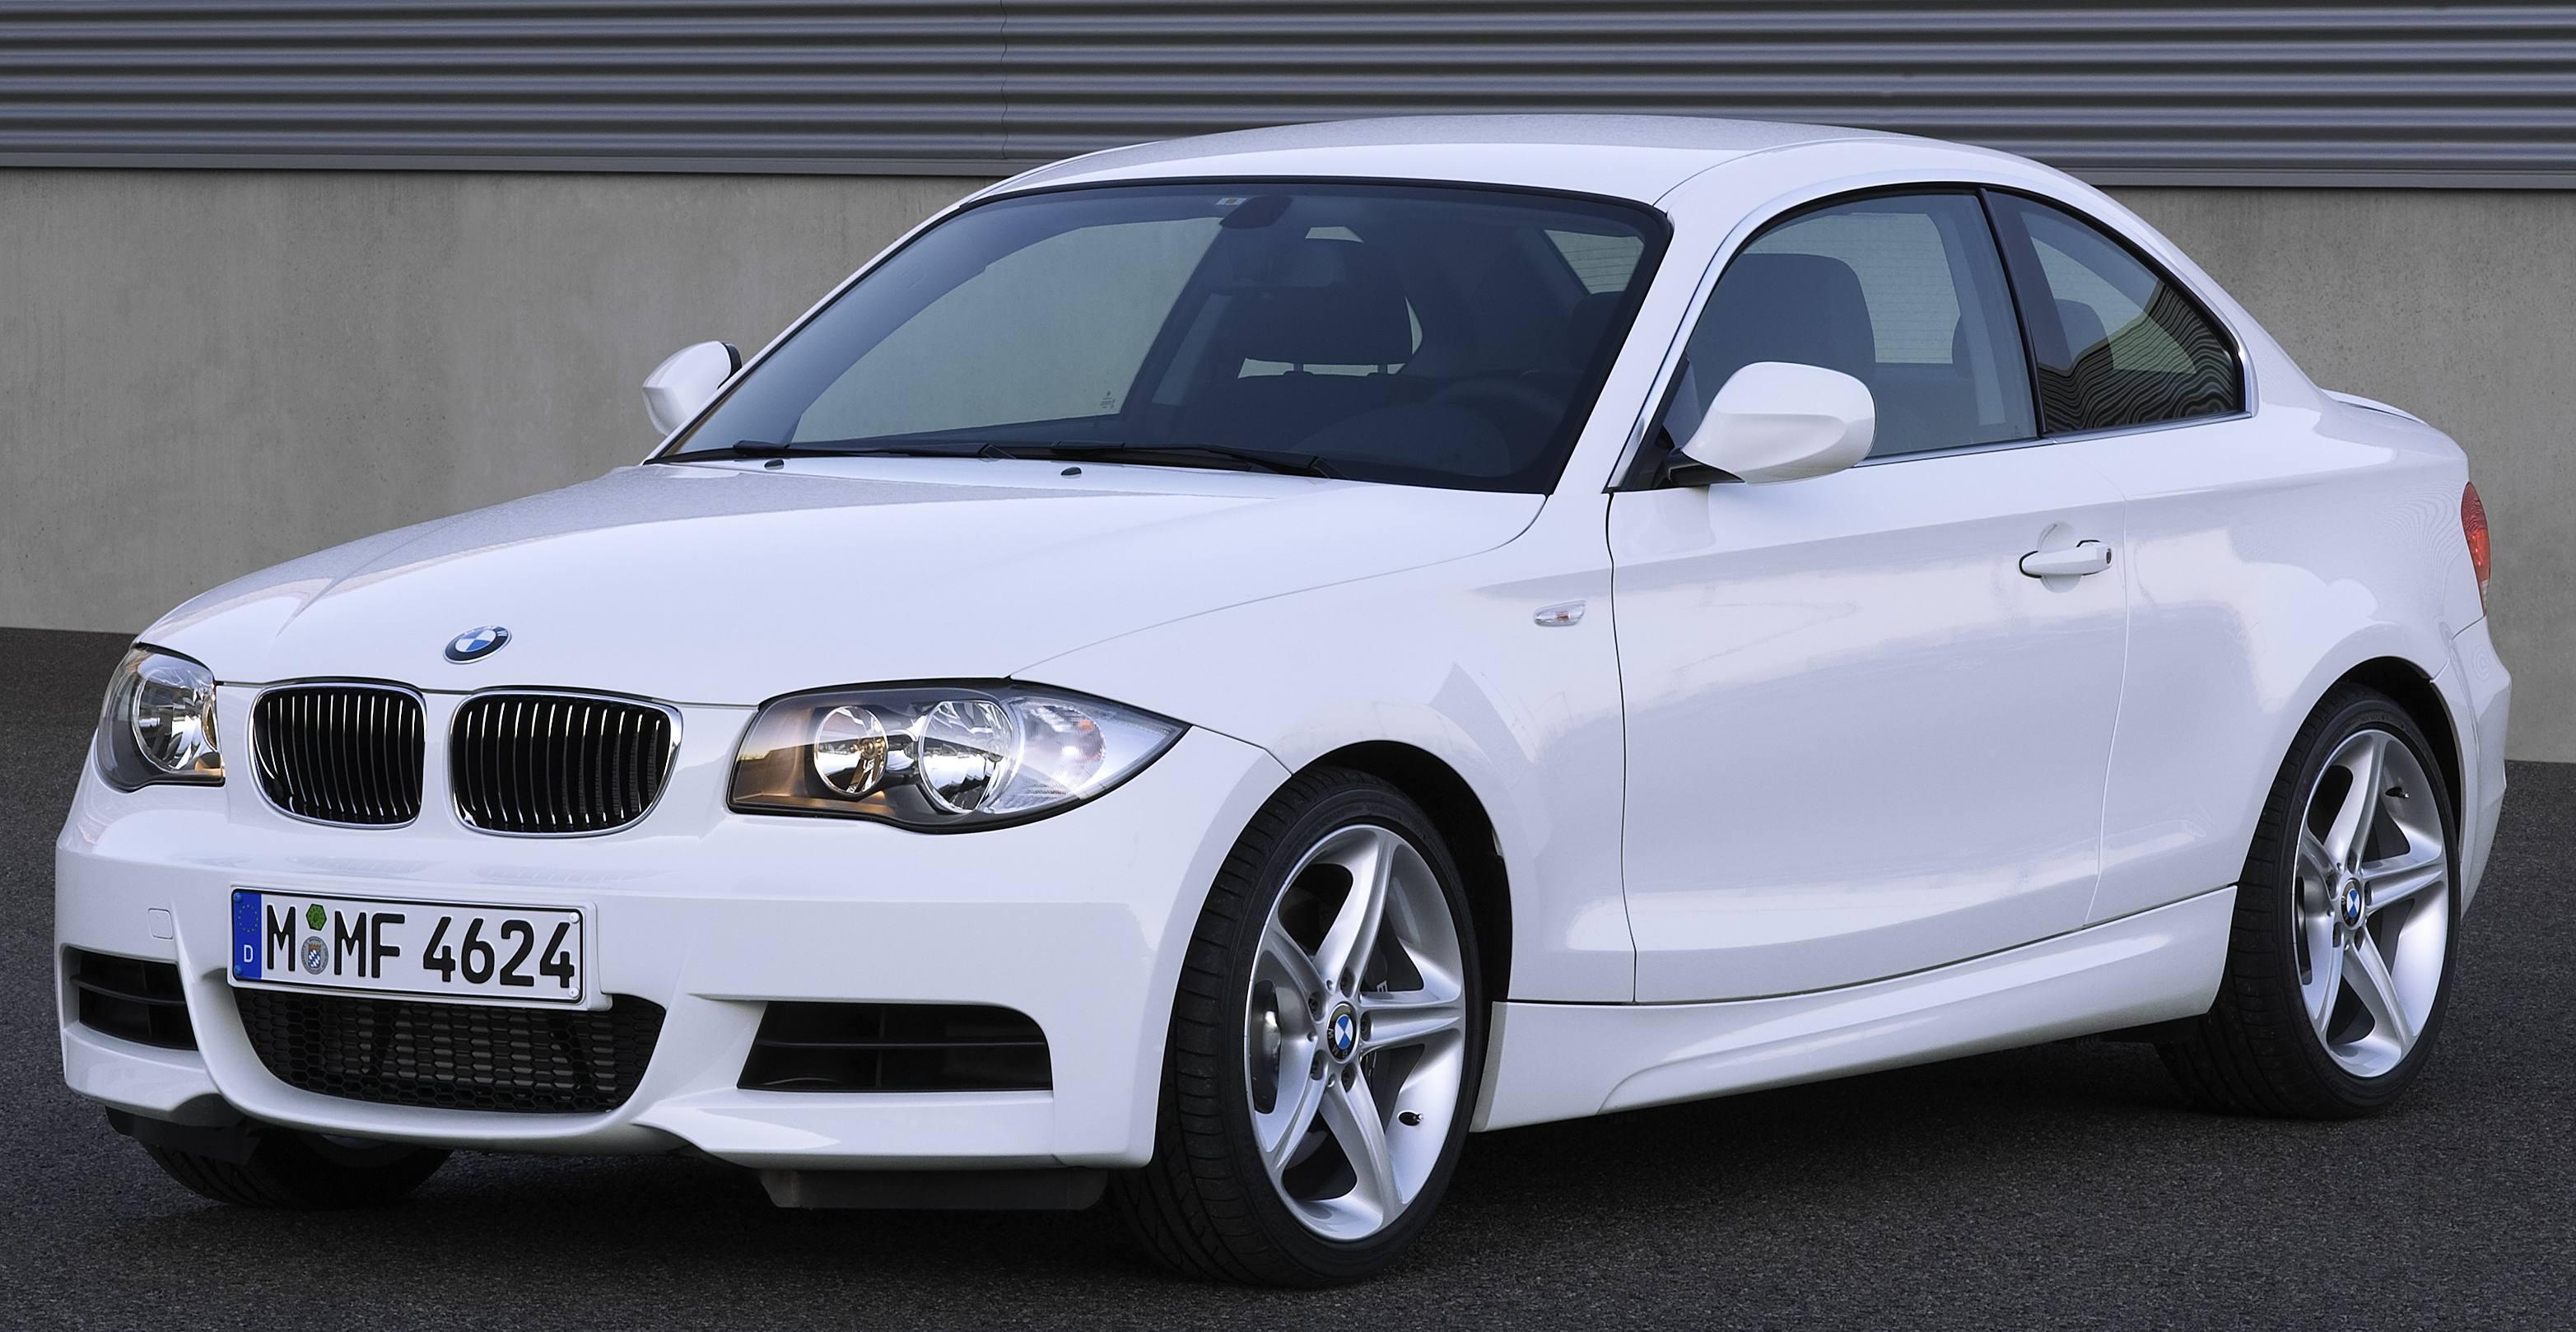 BMW 1 Series E87 Inner Rear Right O//S Door Window Trim Seal Strip Gasket